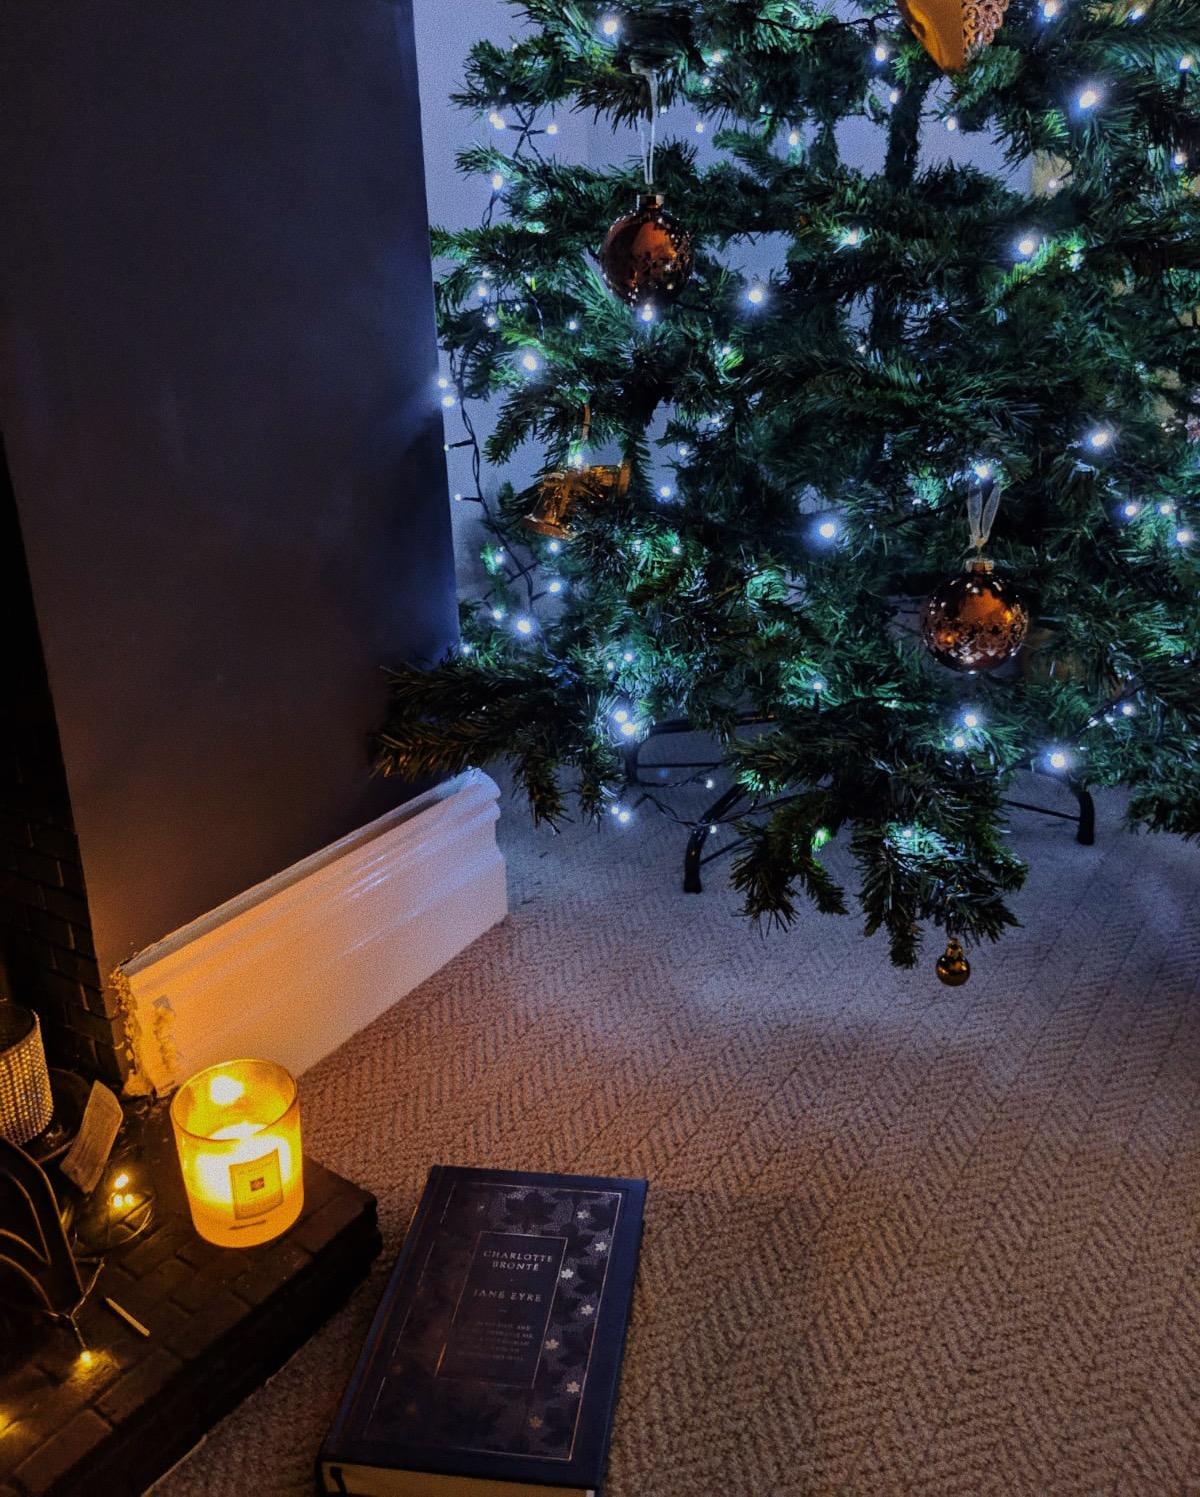 The Christmas Blues